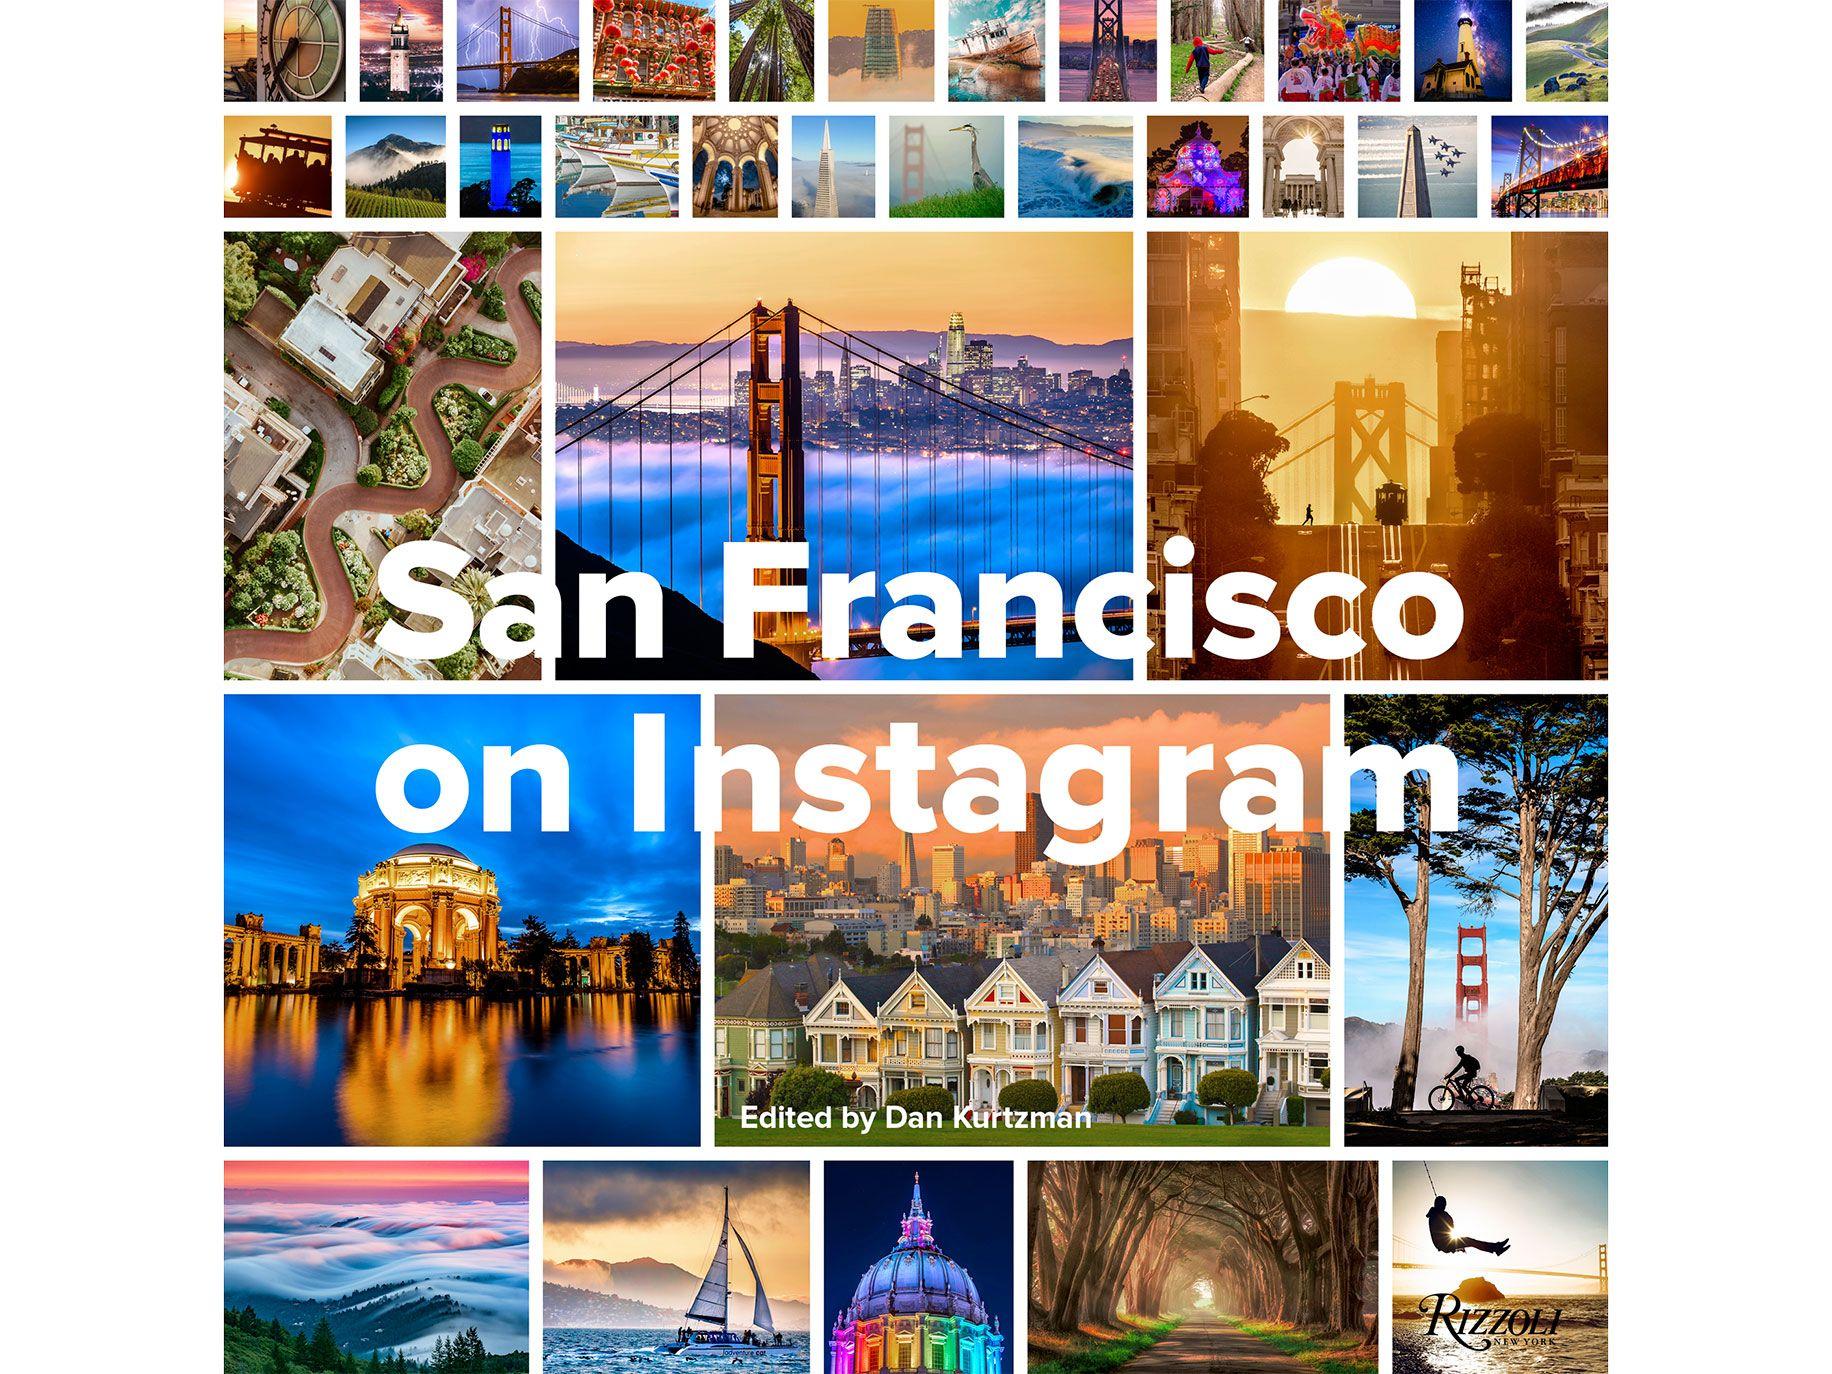 San Francisco on Instagram, edited by Dan Kurtzman, Rizzoli, 208 pages, $24.95